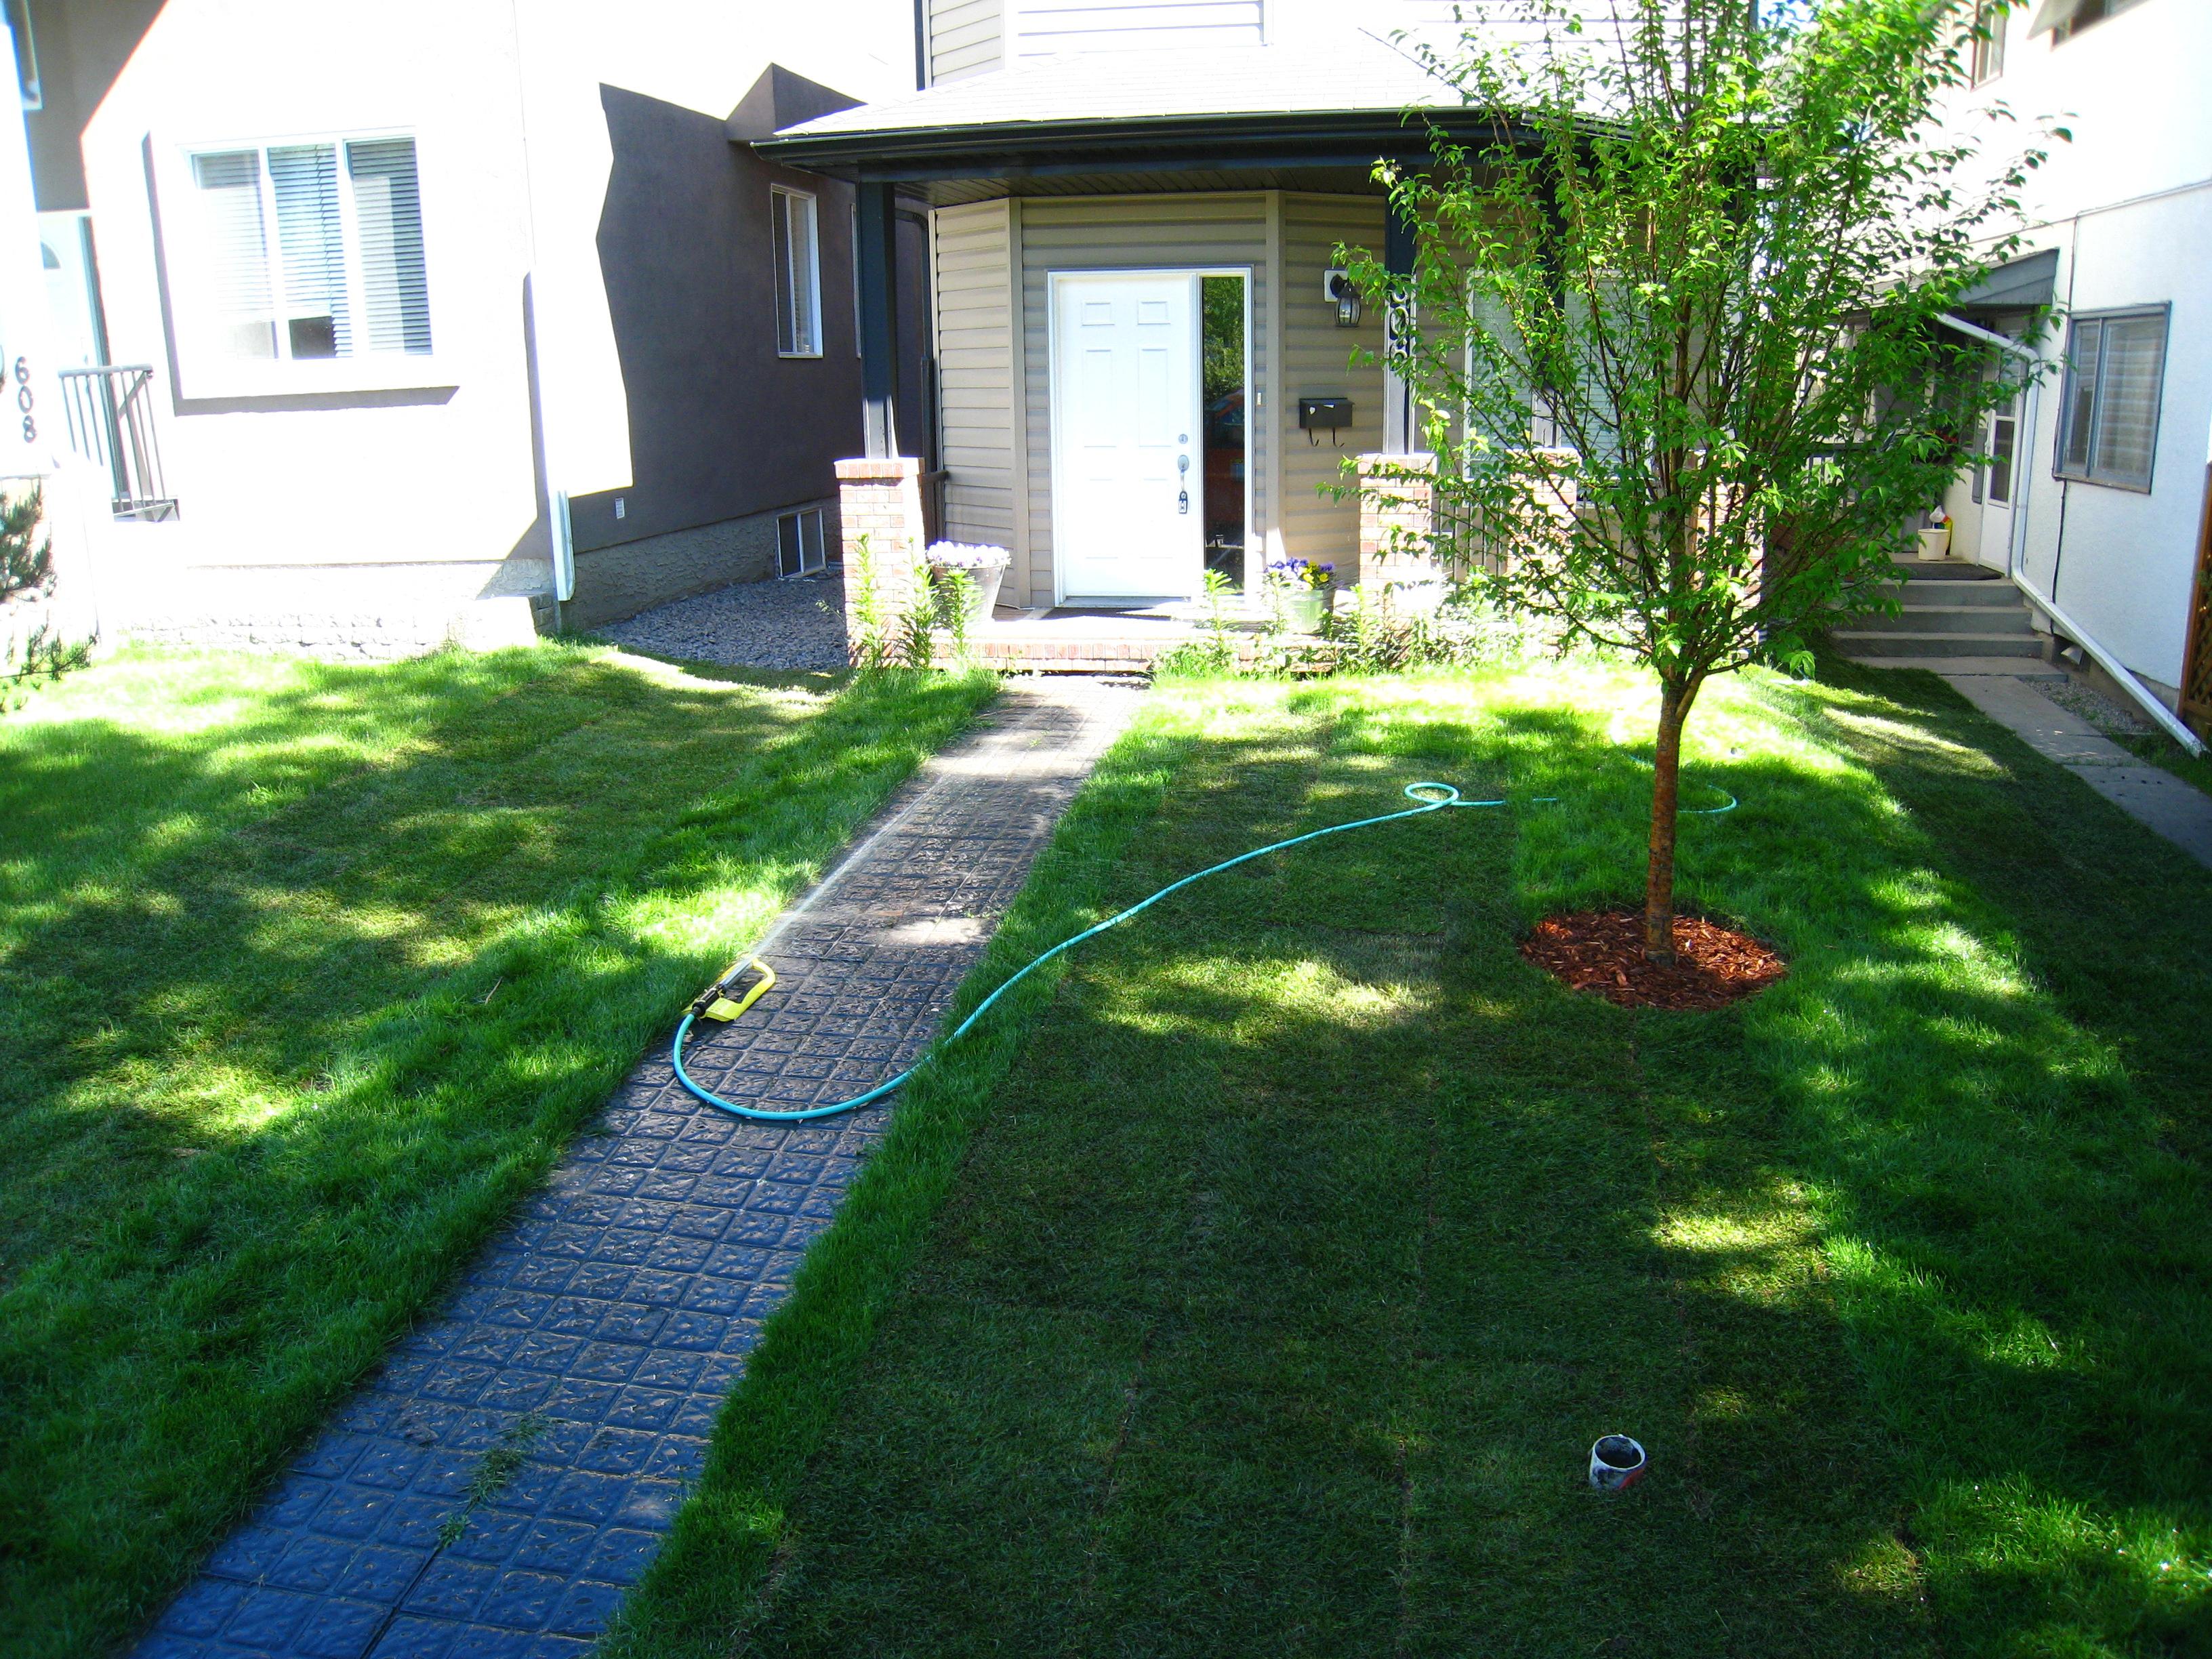 Timber Creek Landscaping Ltd - Landscape Contractors & Designers - 403-472-0481